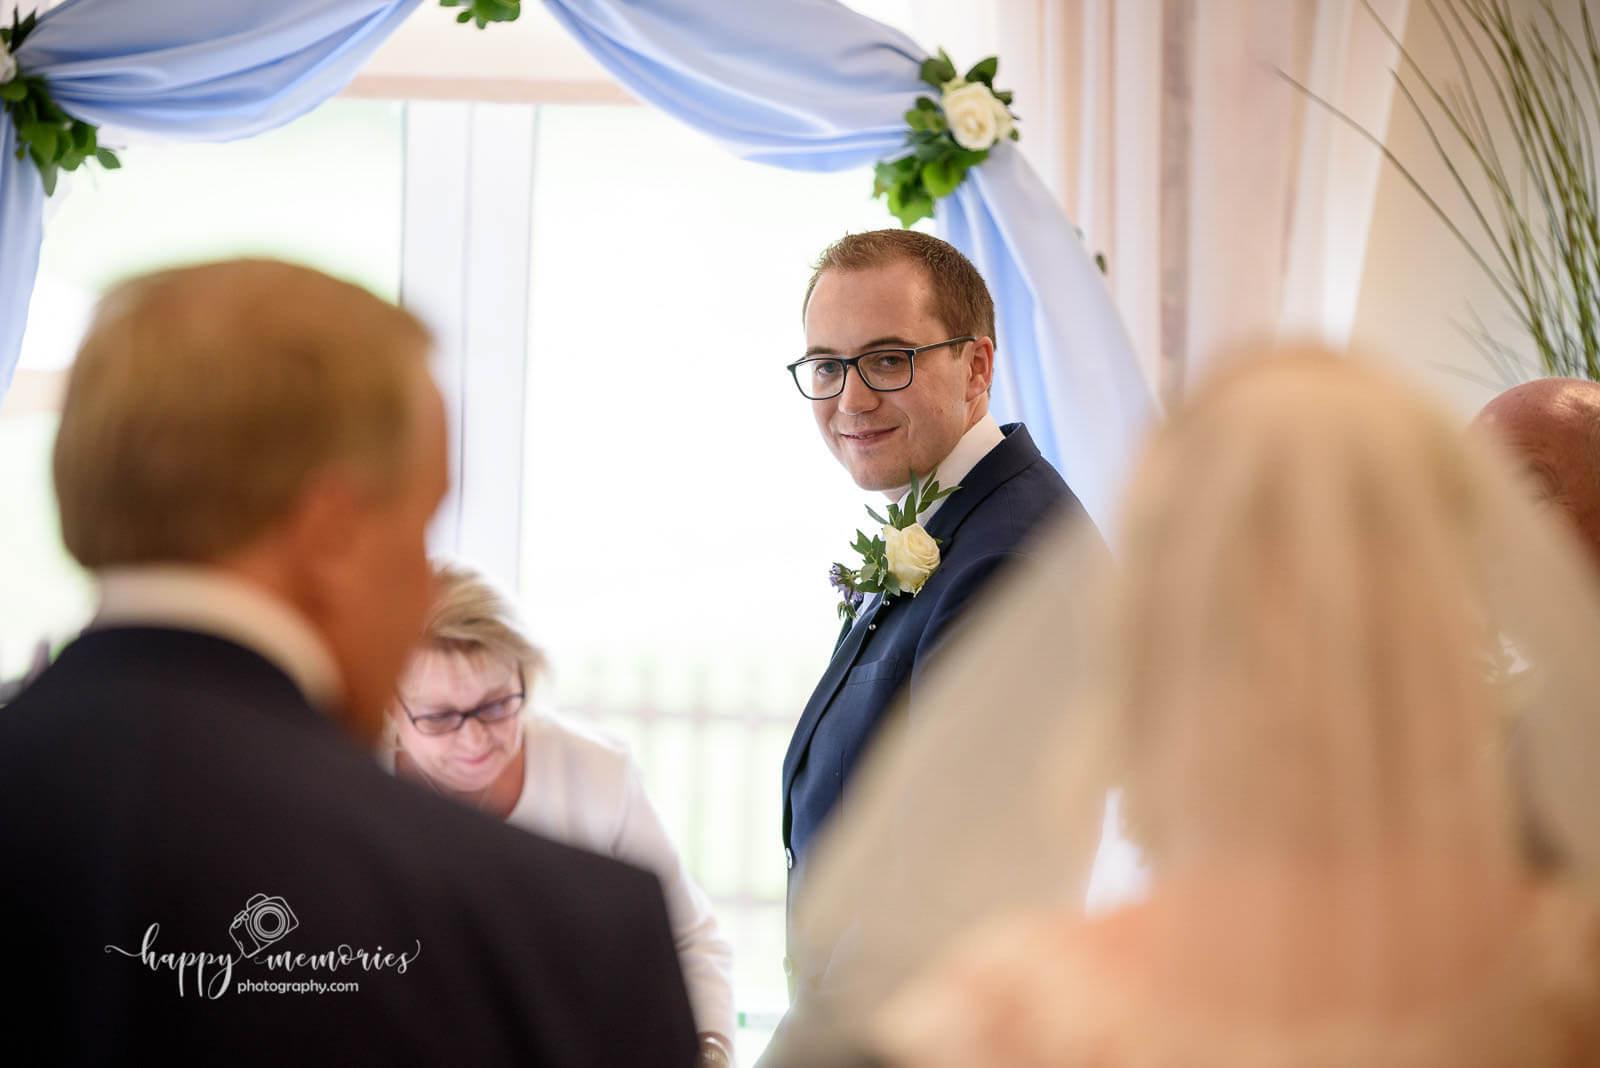 Wedding photographer East Grinstead-24